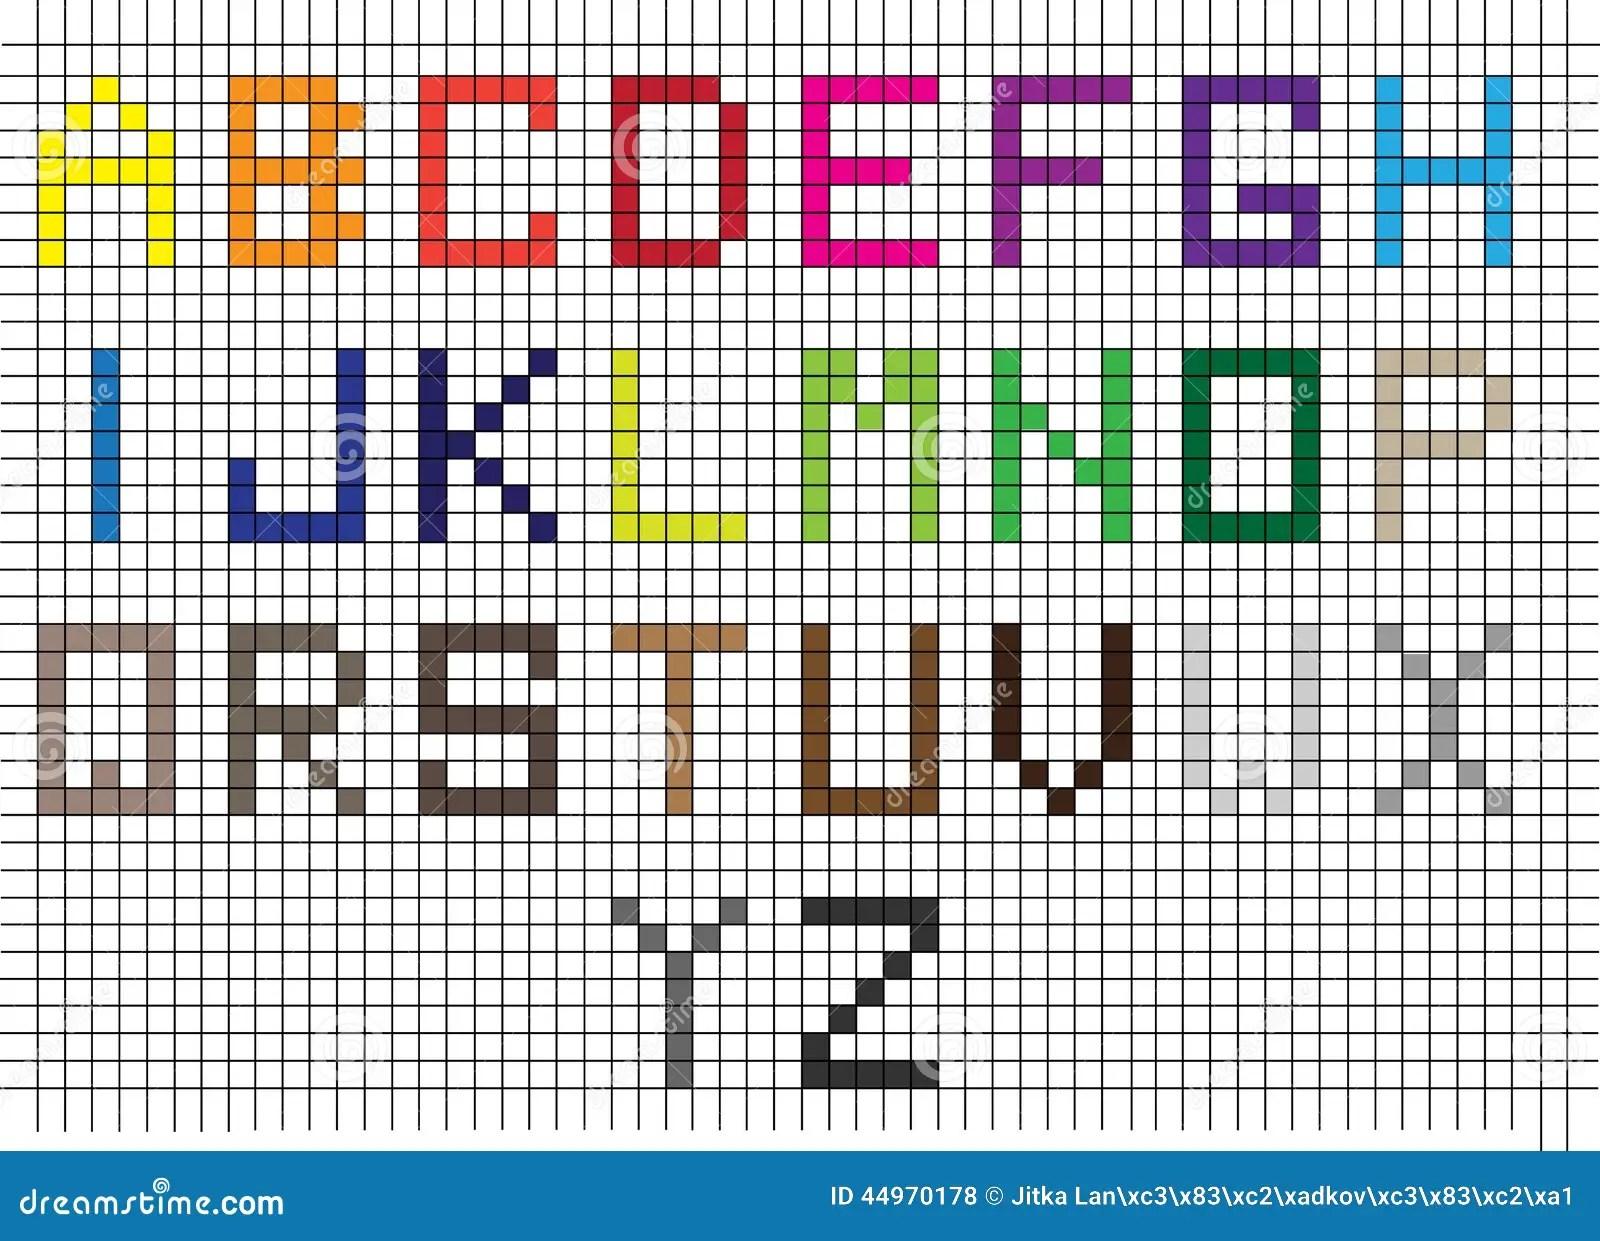 New Alphabet Grid